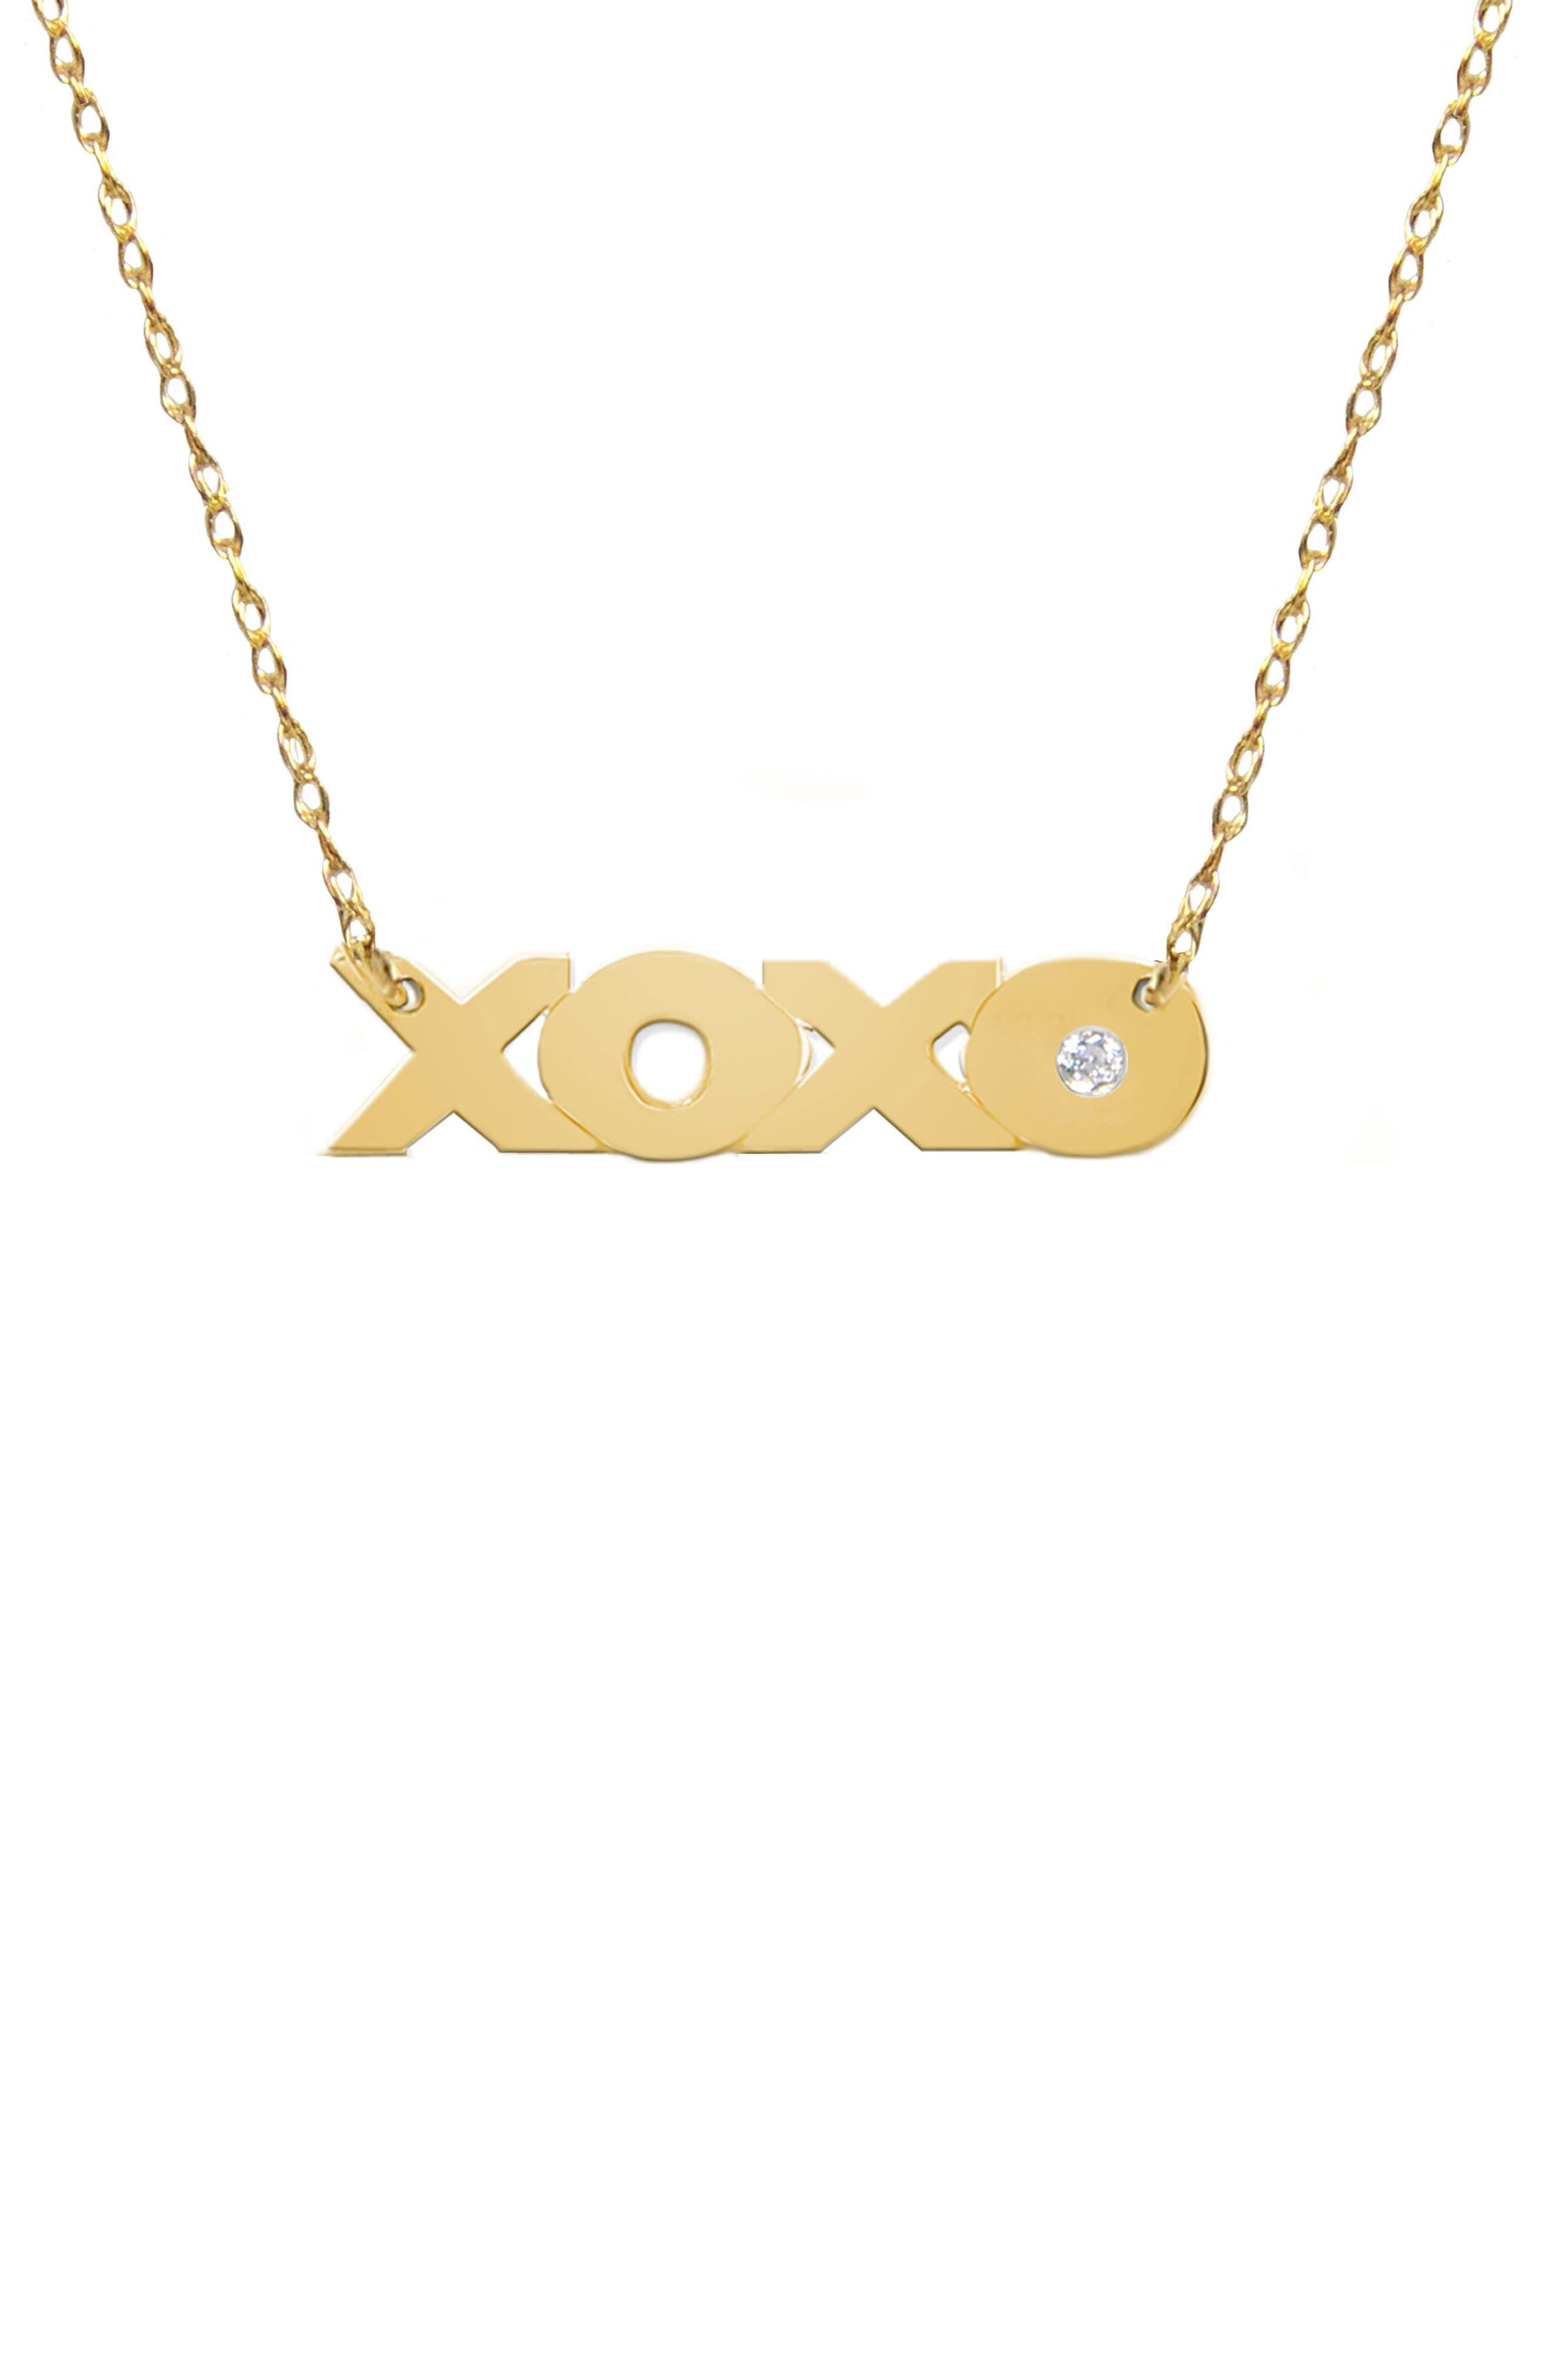 JANE BASCH DESIGNS XOXO Diamond Pendant Necklace